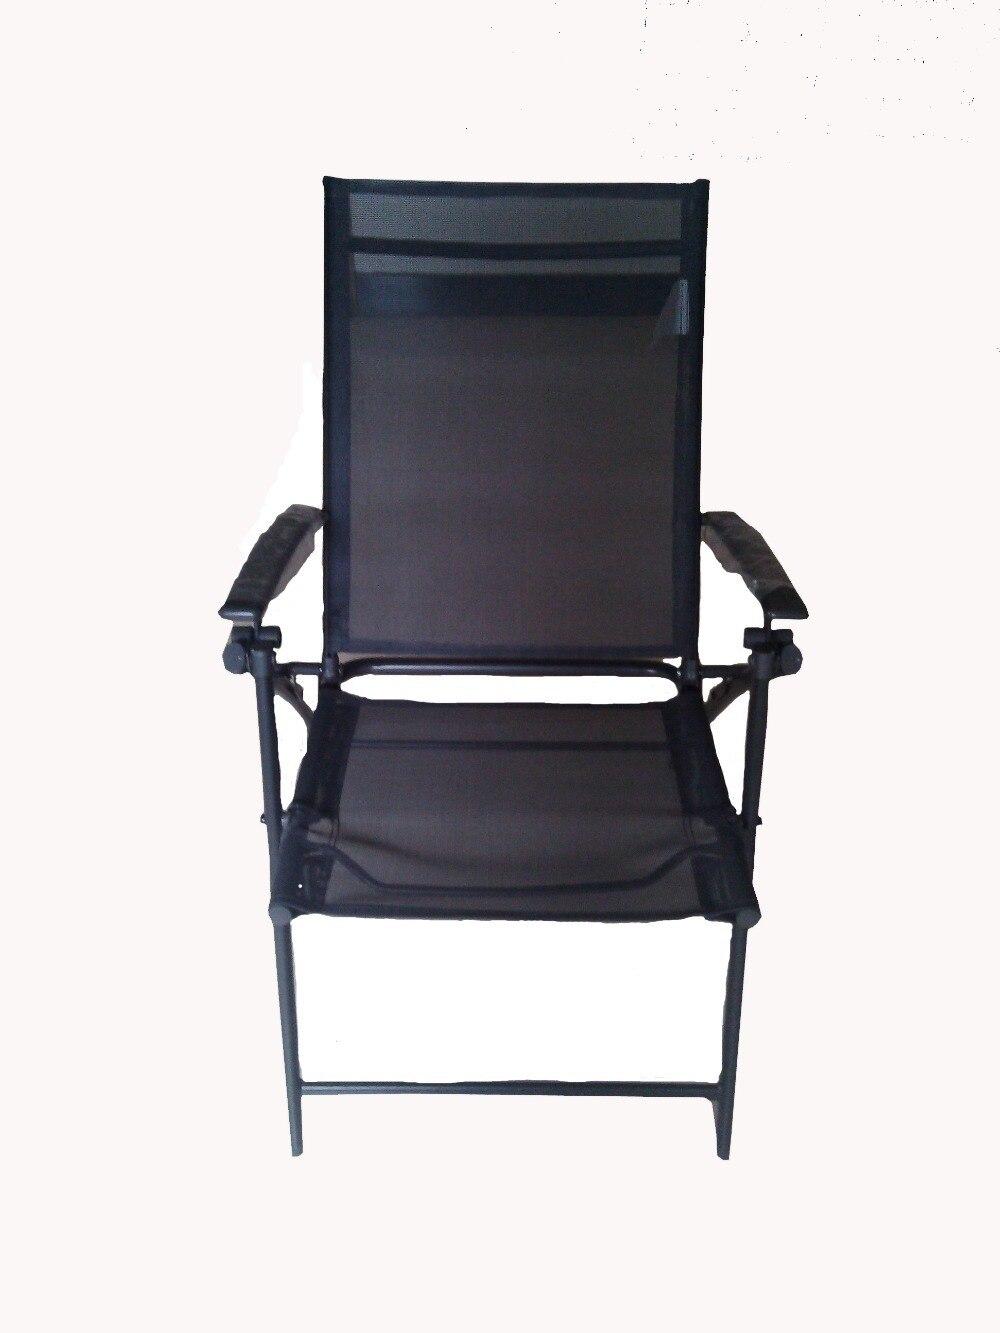 Superior Fashion Leisure Outdoor Folding Chair Metal Garden Mesh